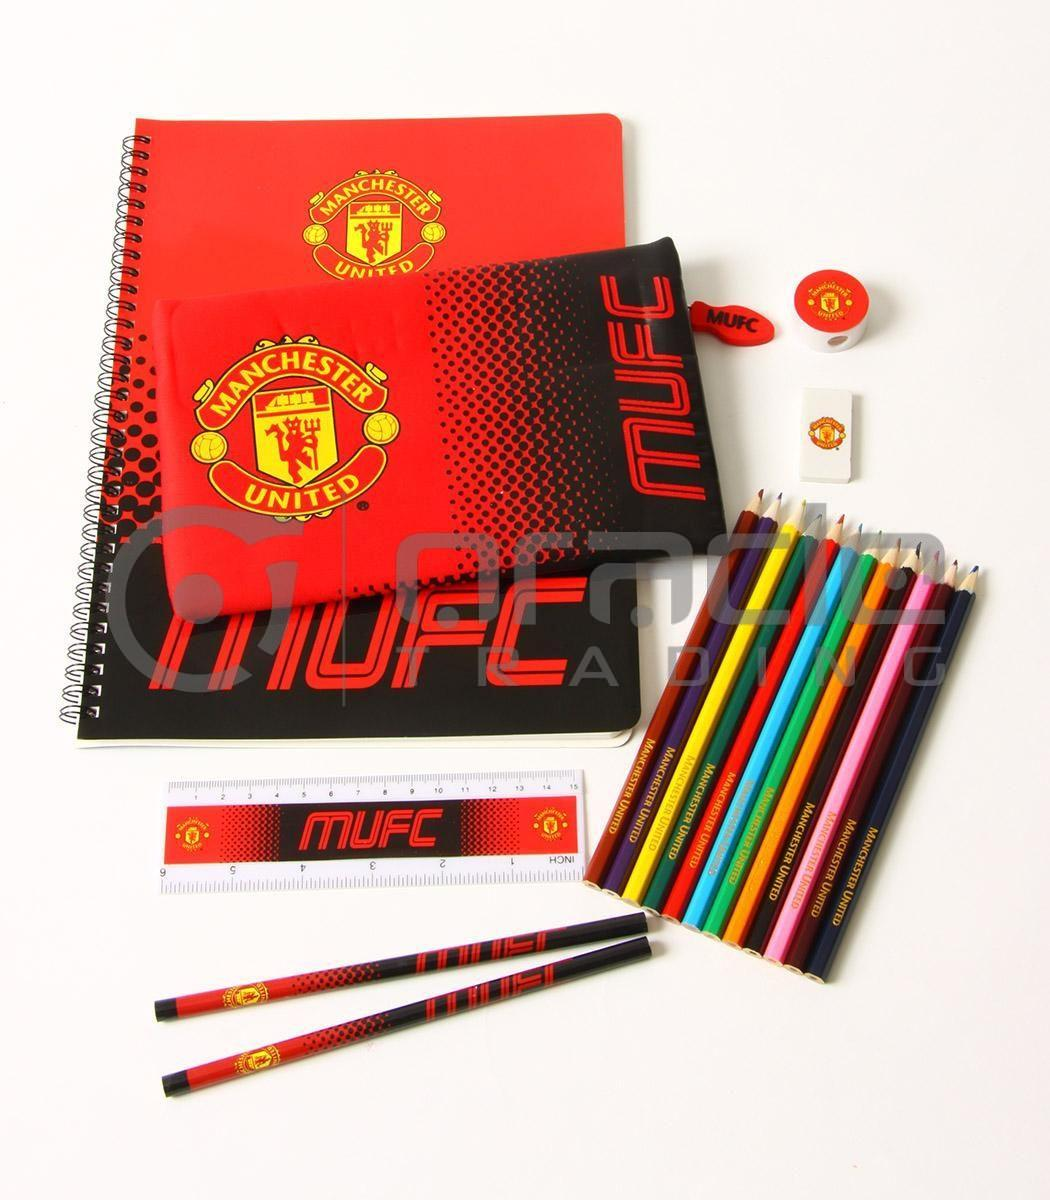 Manchester United Ultimate Stationery Set